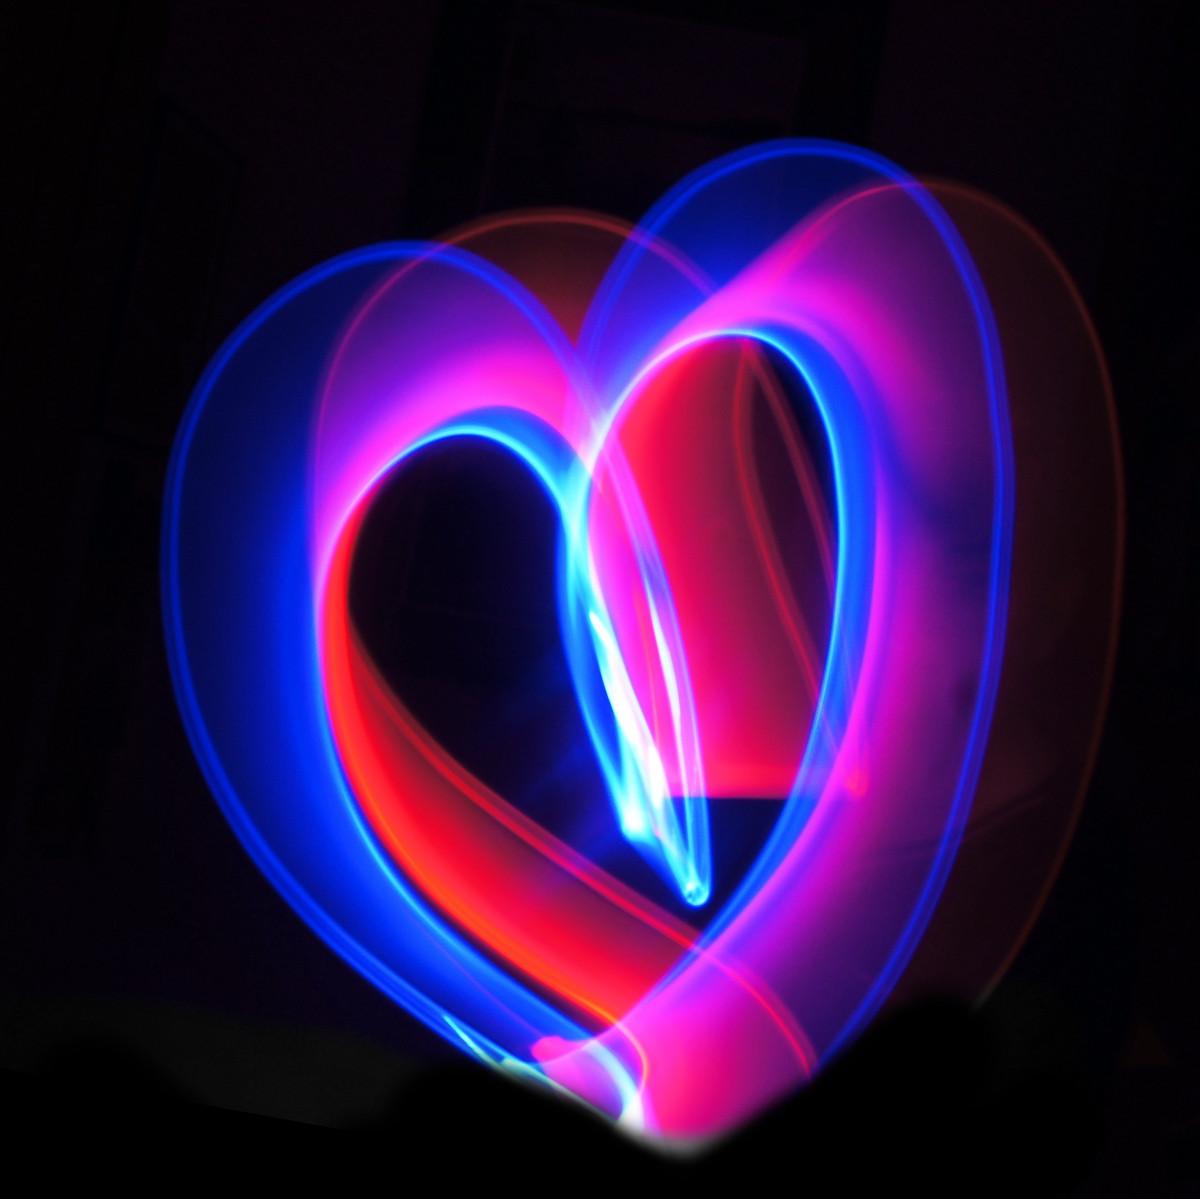 Gambar Cahaya Abstrak Struktur Gelap Garis Warna Kegelapan